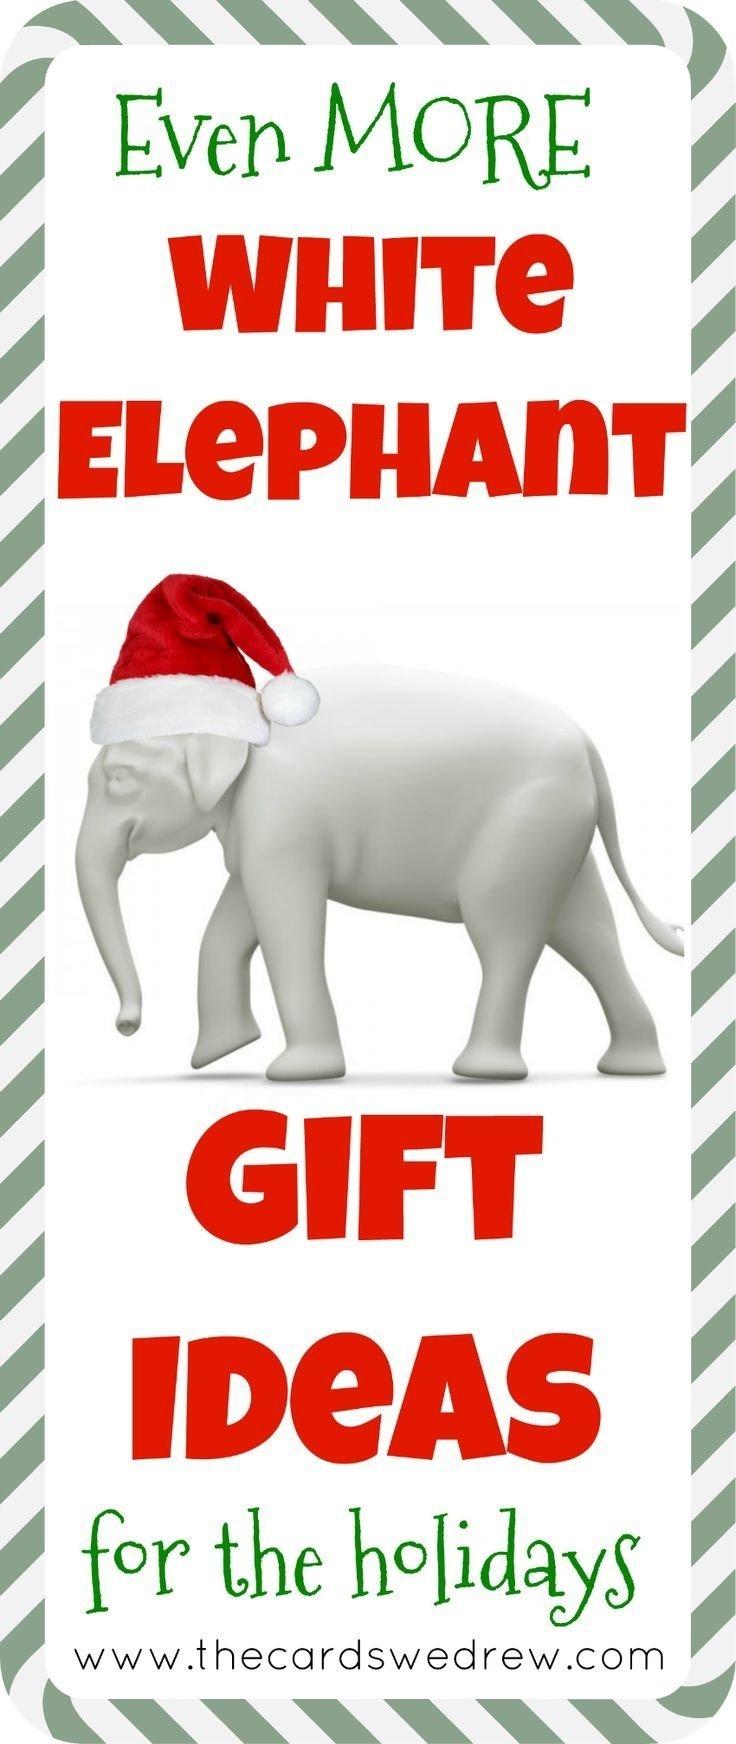 10 stunning white elephant christmas gift ideas 395 best gift ideas images on pinterest christmas presents - Best White Elephant Christmas Gifts